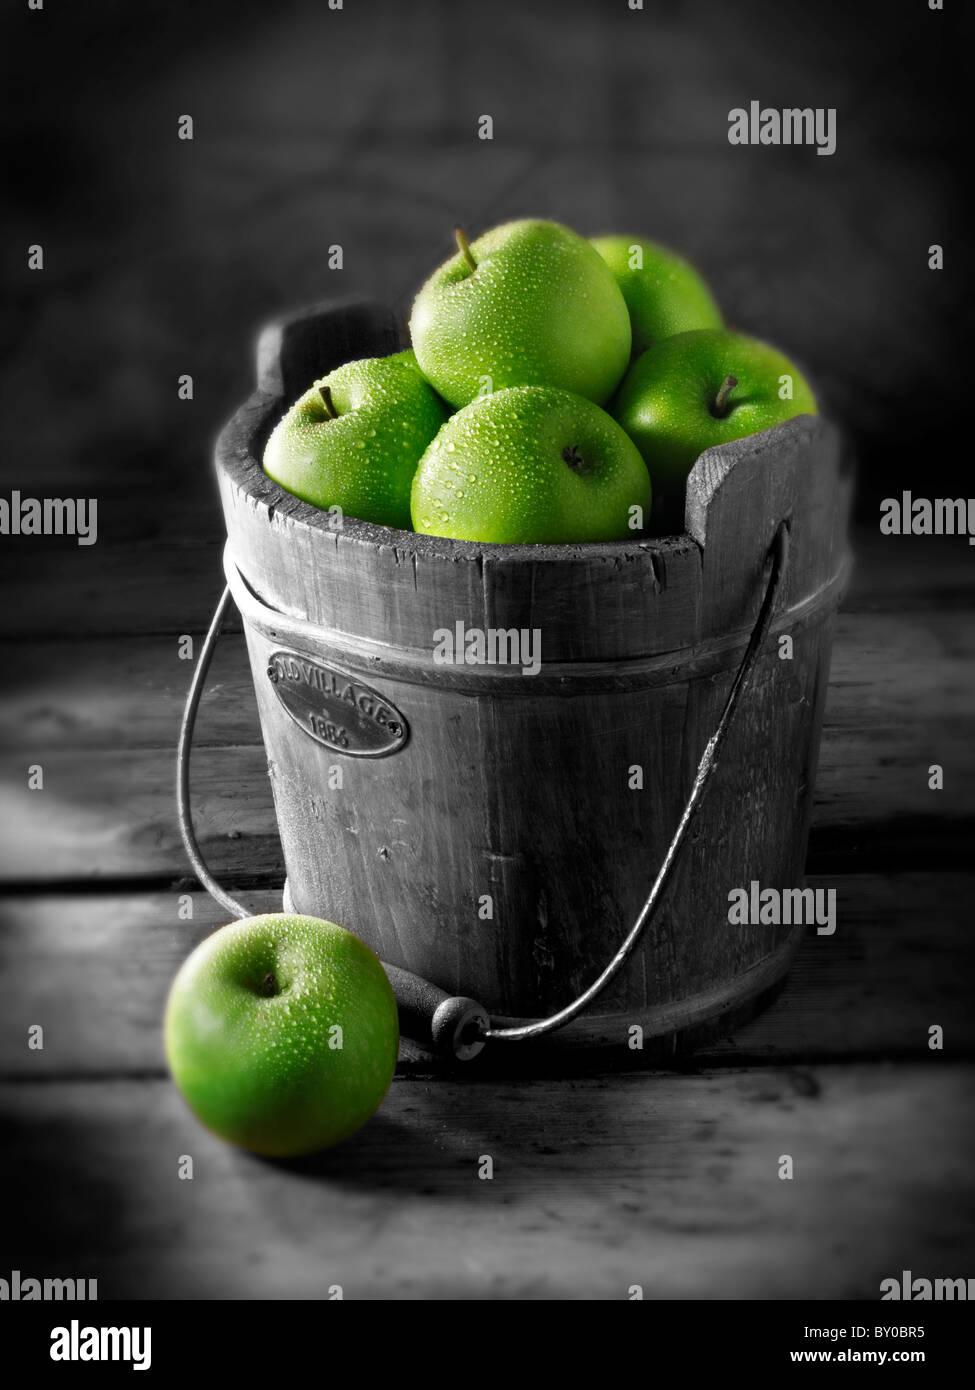 Fresh Granny Smiths apples - Stock Image